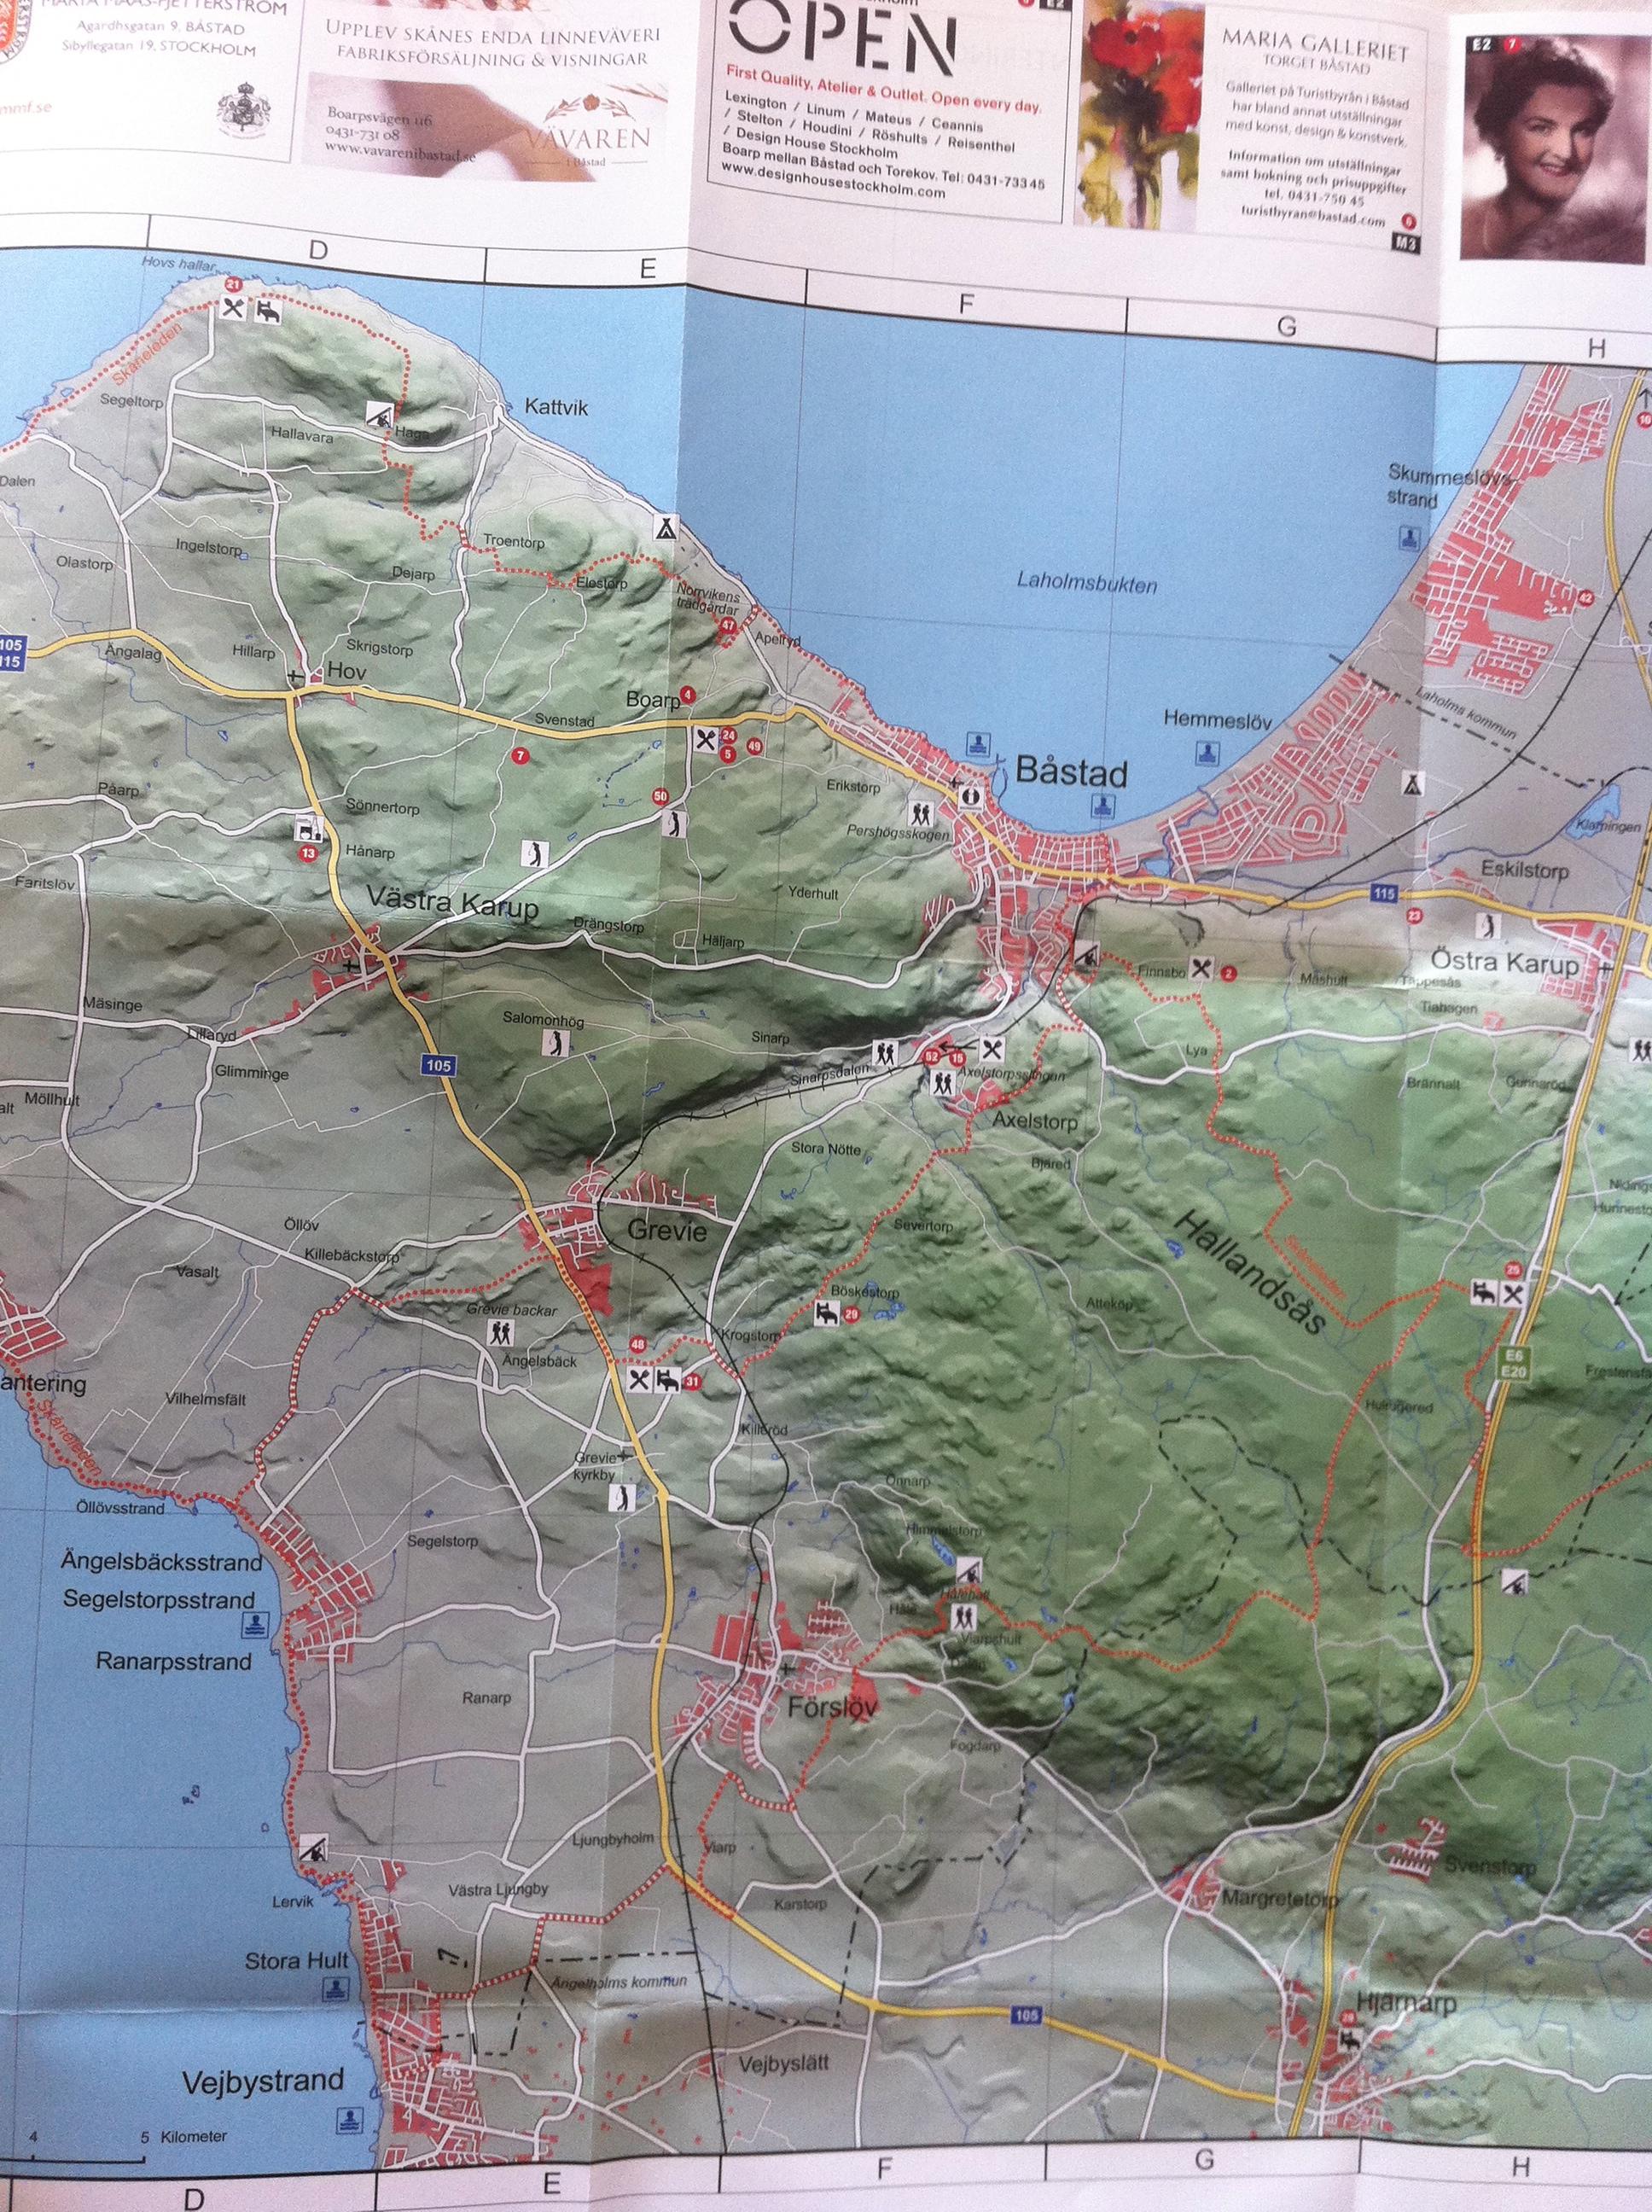 bjärehalvön karta Karta över Bjärehalvön inklusive Hallandsåsen.   Erik Wickström  bjärehalvön karta